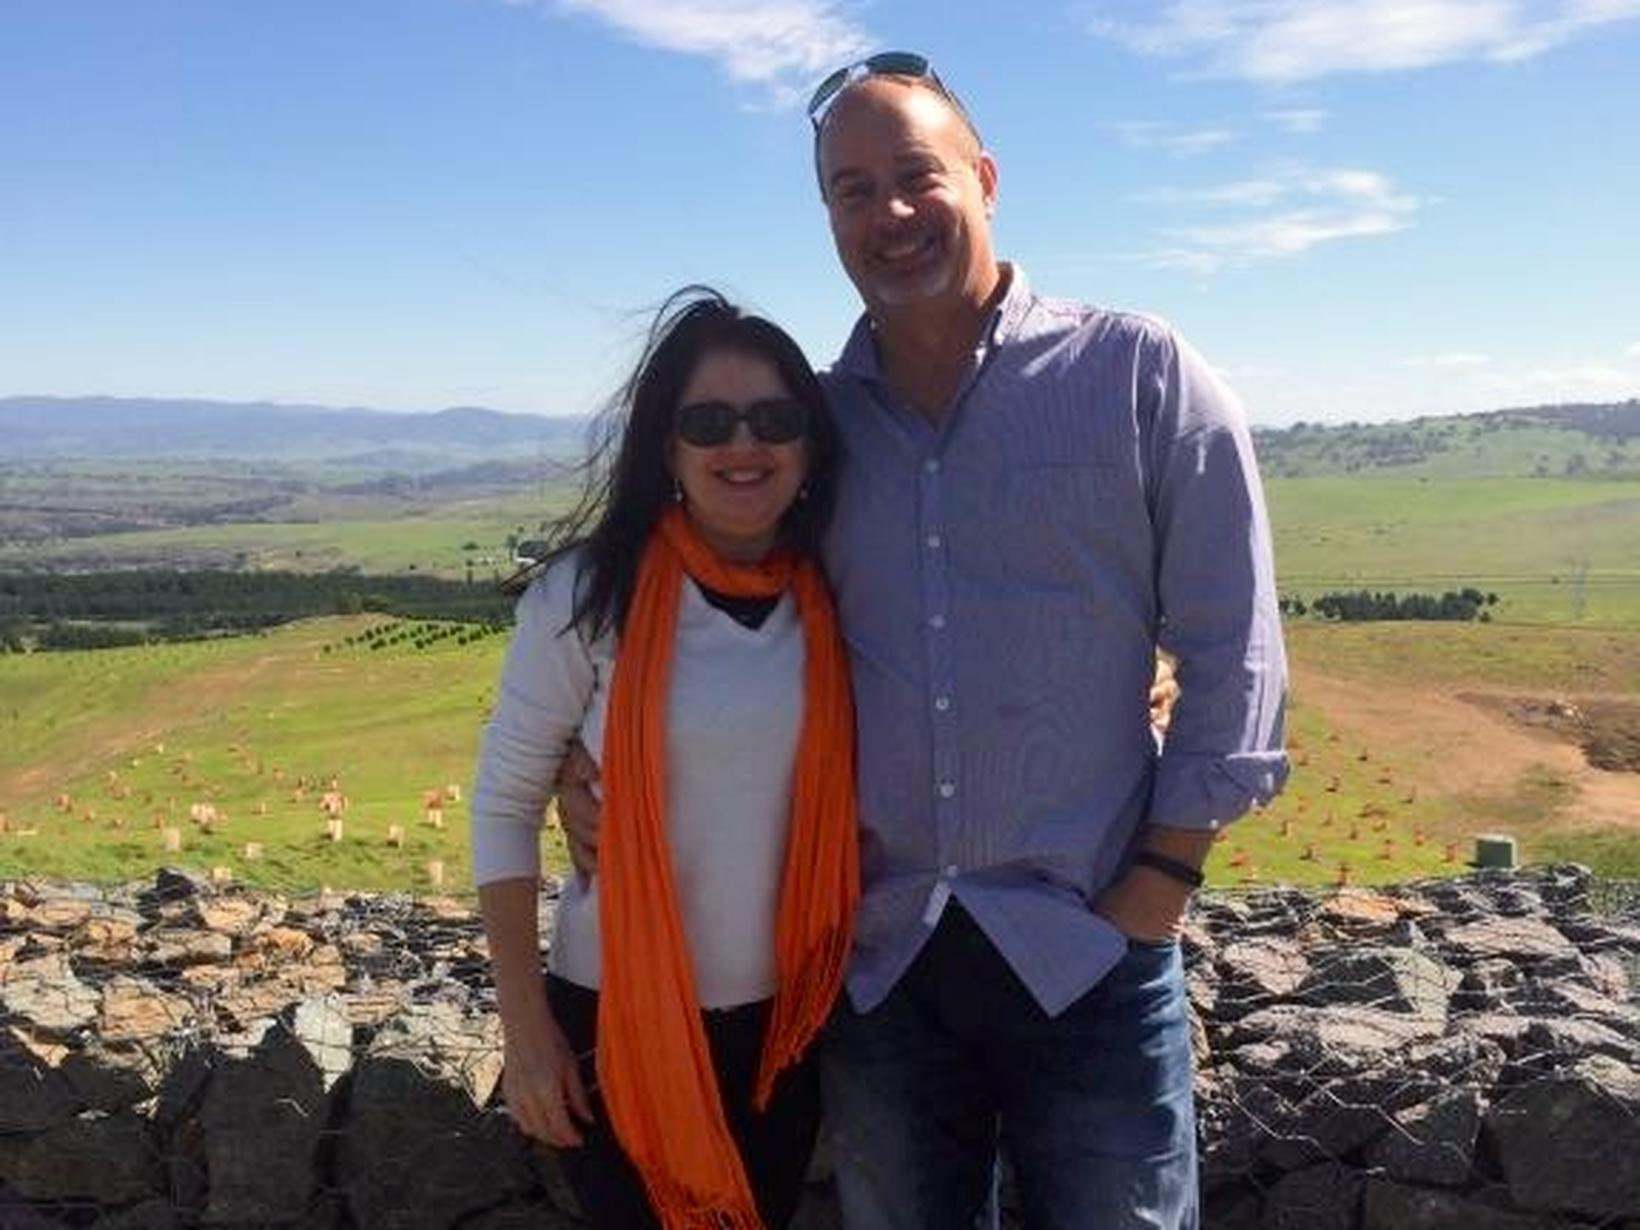 Ian & Dawn from Sydney, New South Wales, Australia